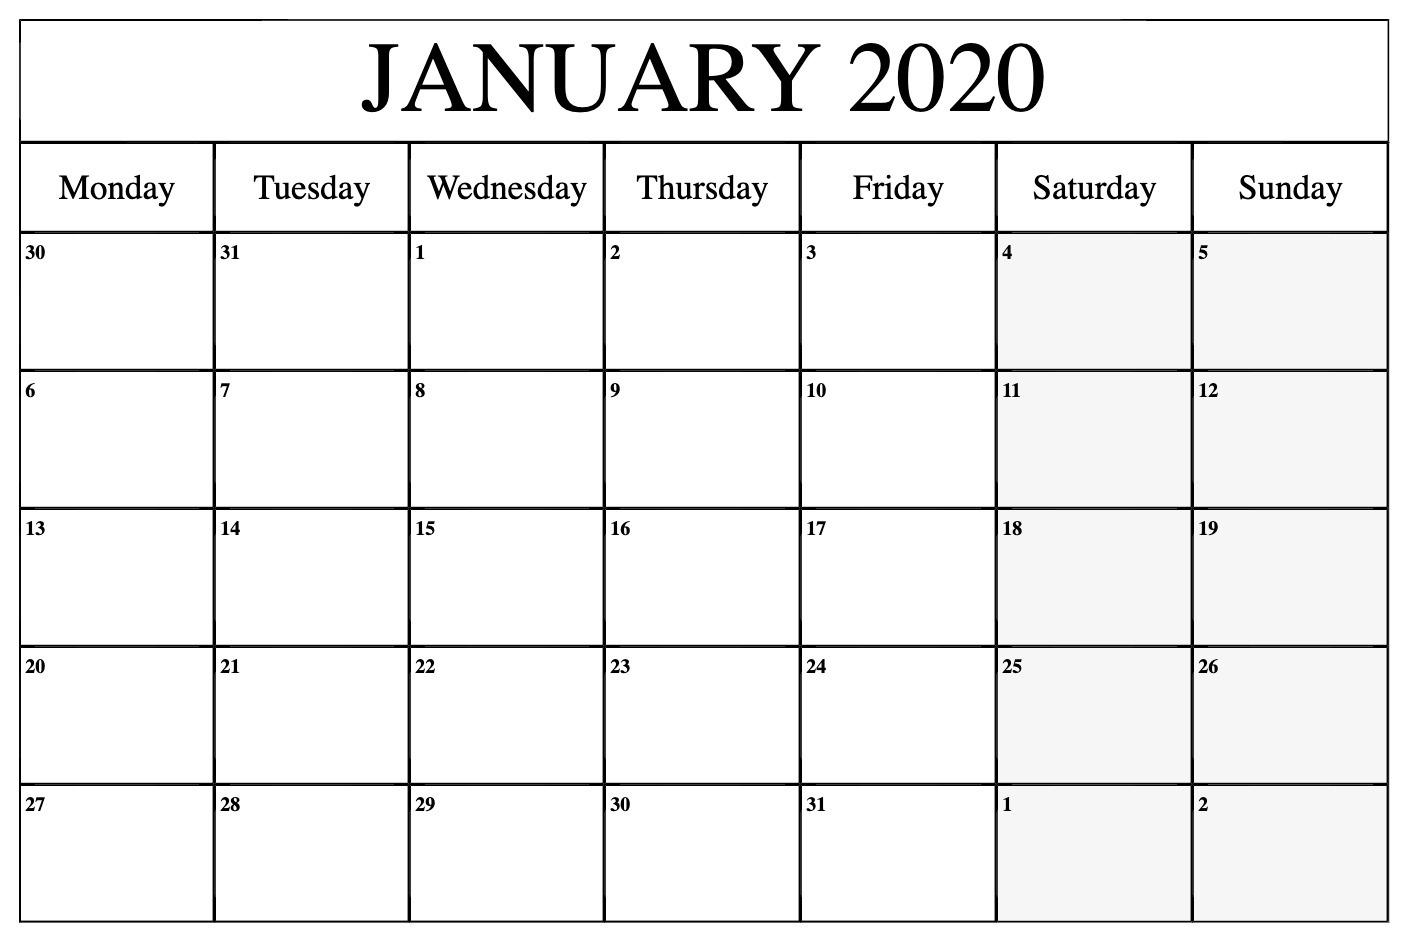 Monthly January 2020 Calendar Printable Pdf Word Excel regarding Jan 2020 Printable Calendar